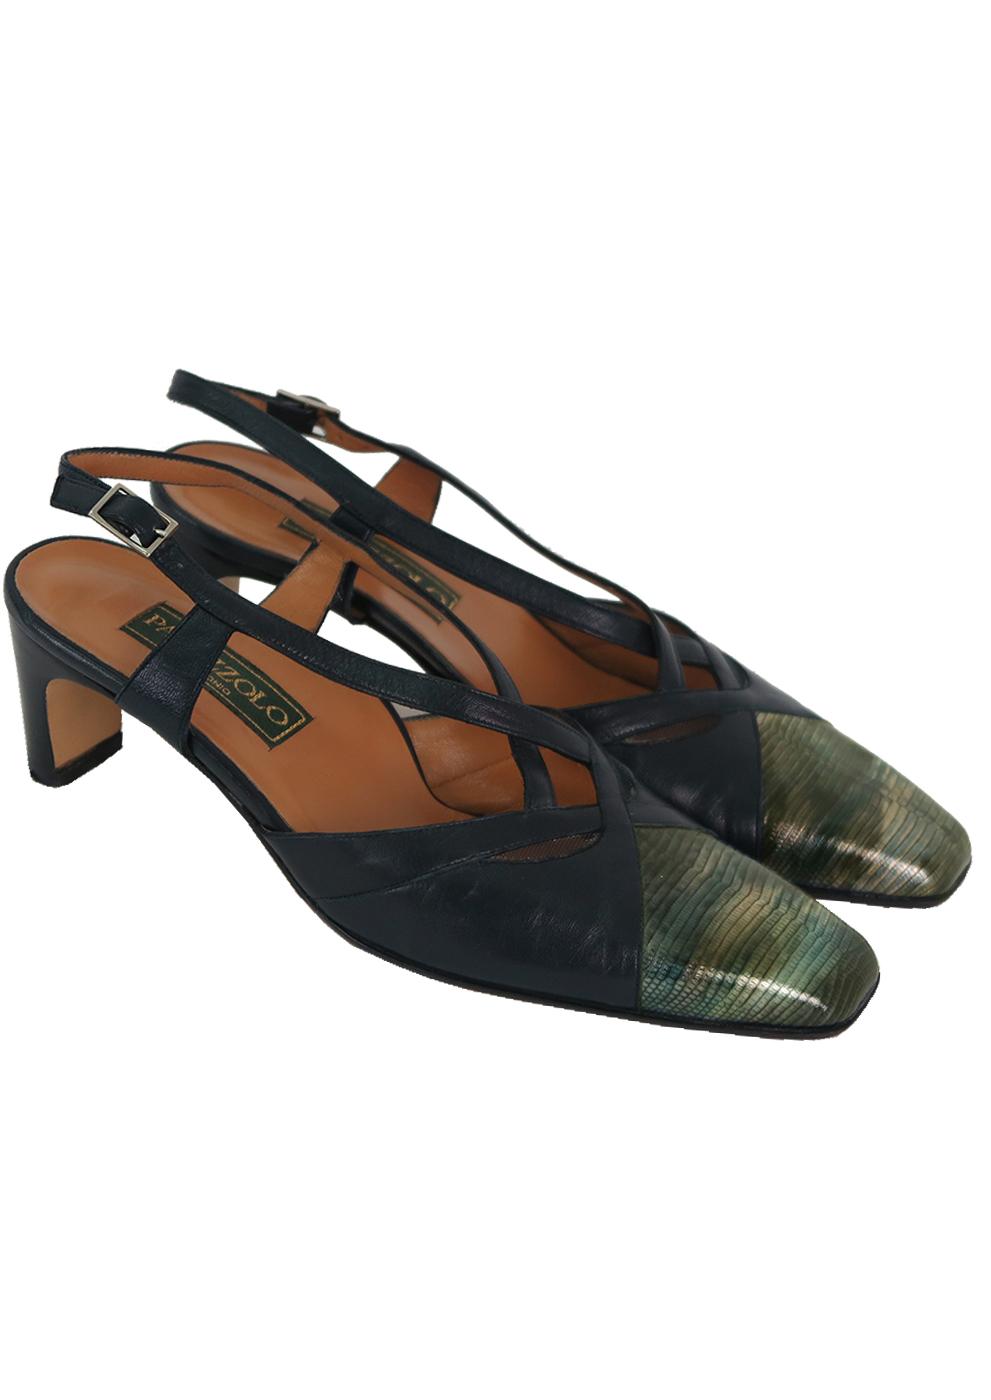 b57daca031d9d Navy Blue Leather Slingback Mid Heel Shoes with Metallic Coloured Toecap -  UK 4.5